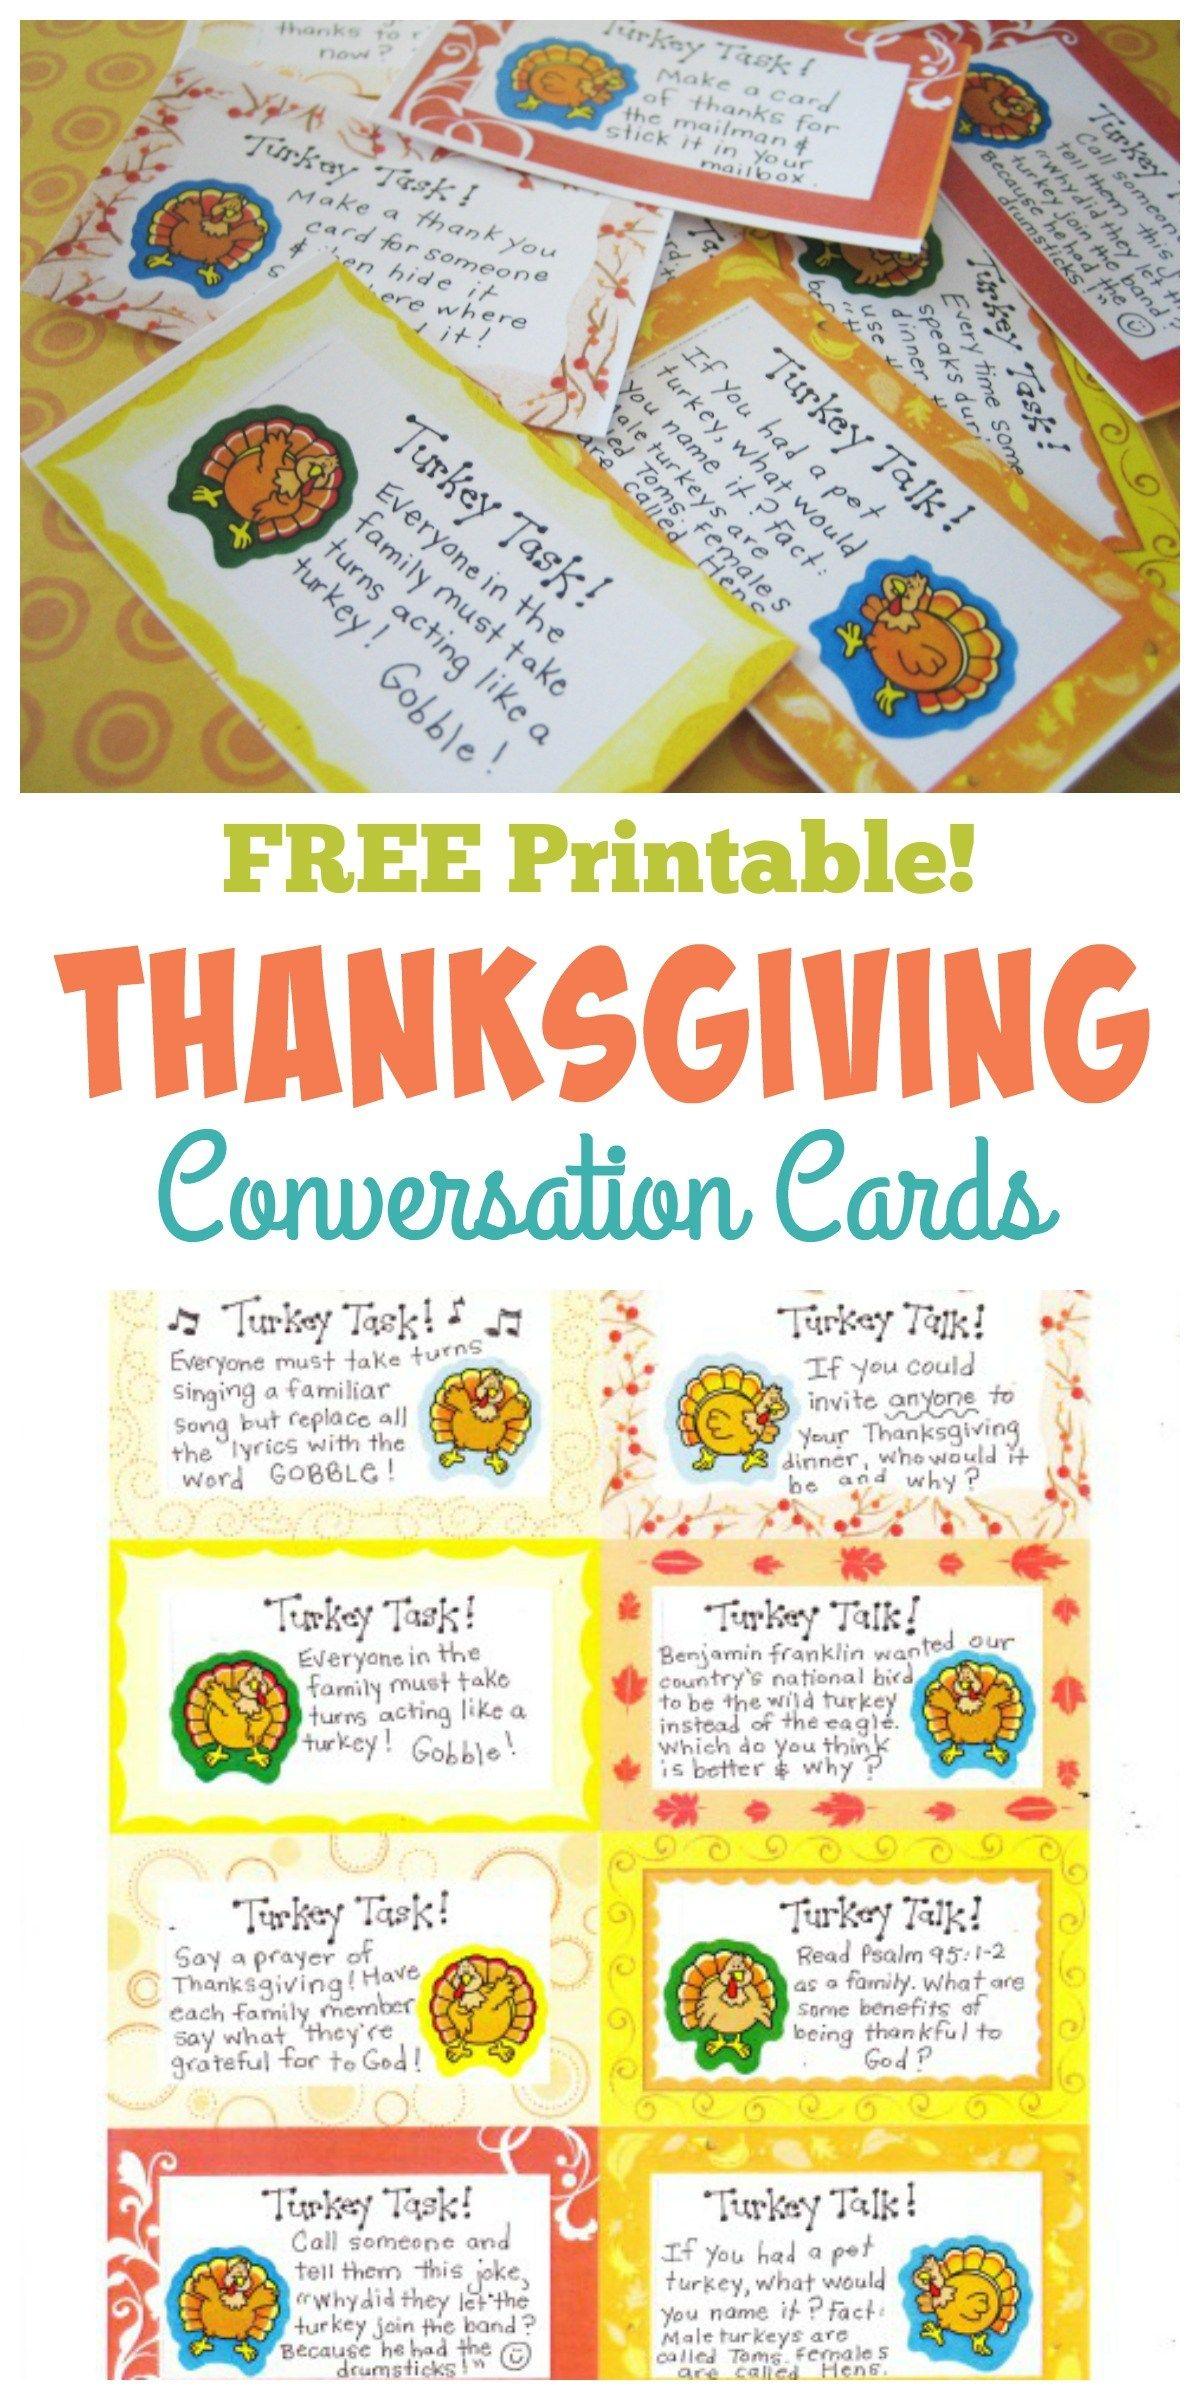 Thanksgiving Conversation Cards